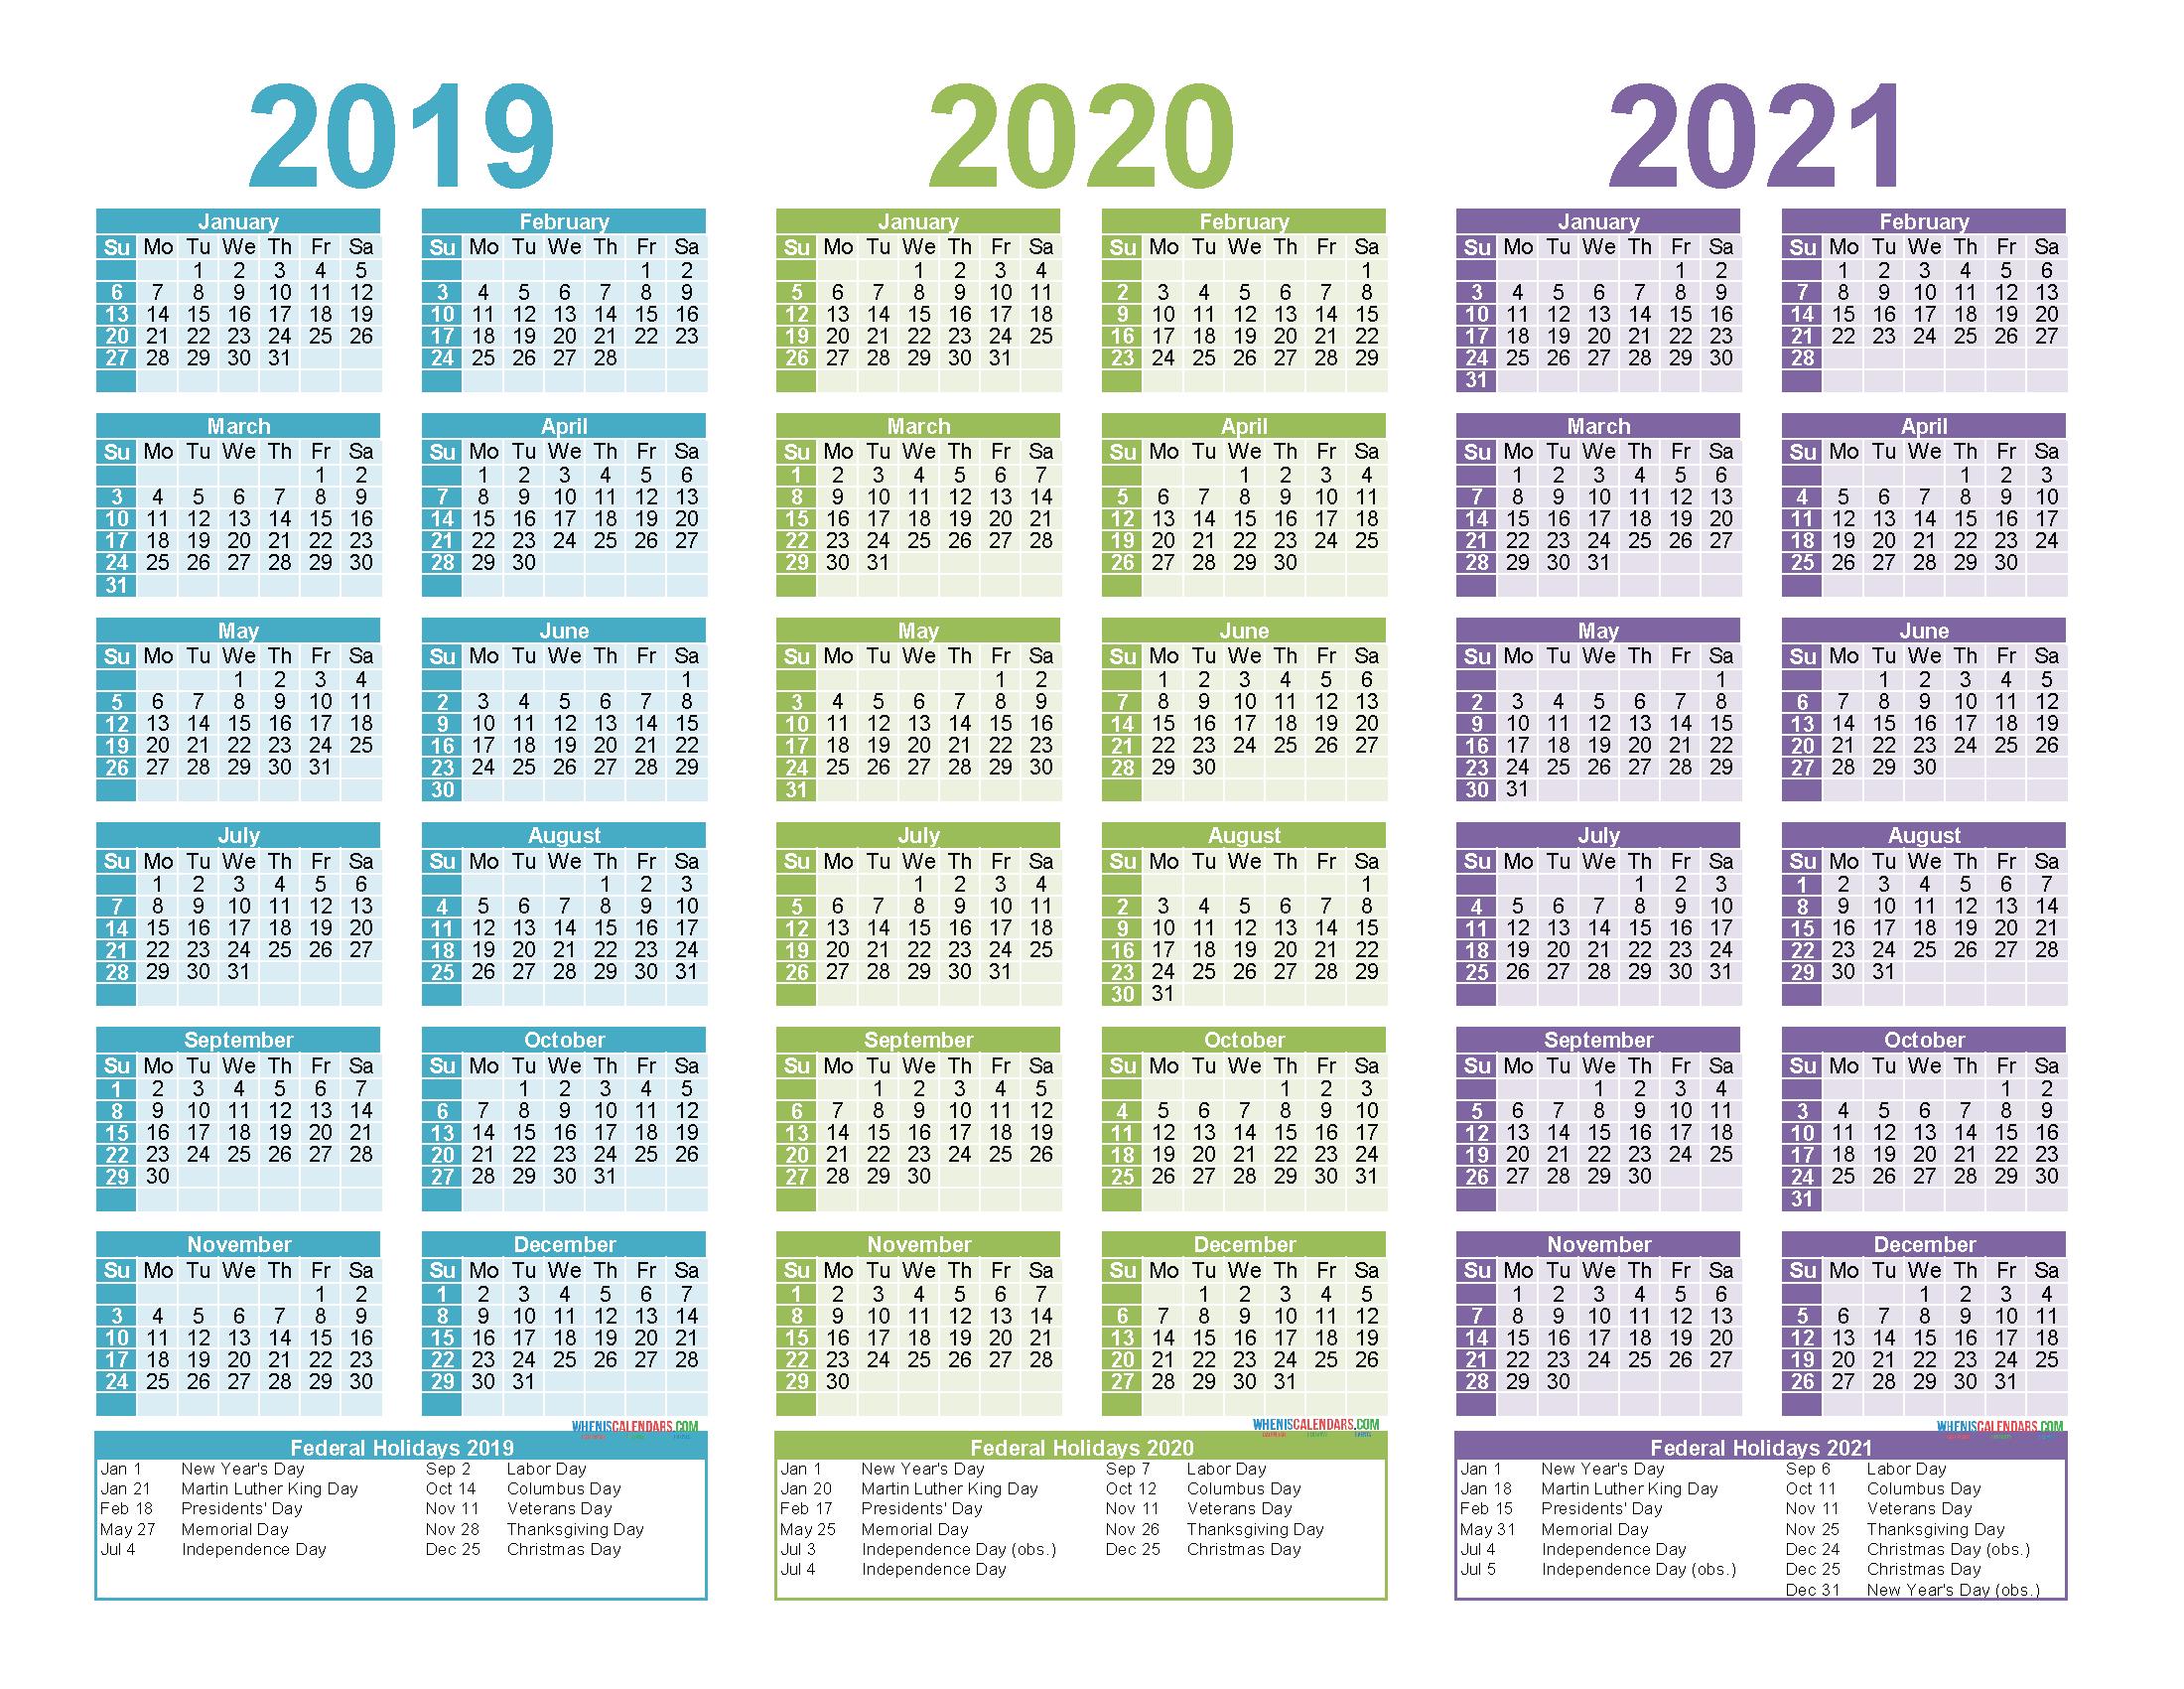 Free Printable 2019 2020 2021 Calendar With Holidays